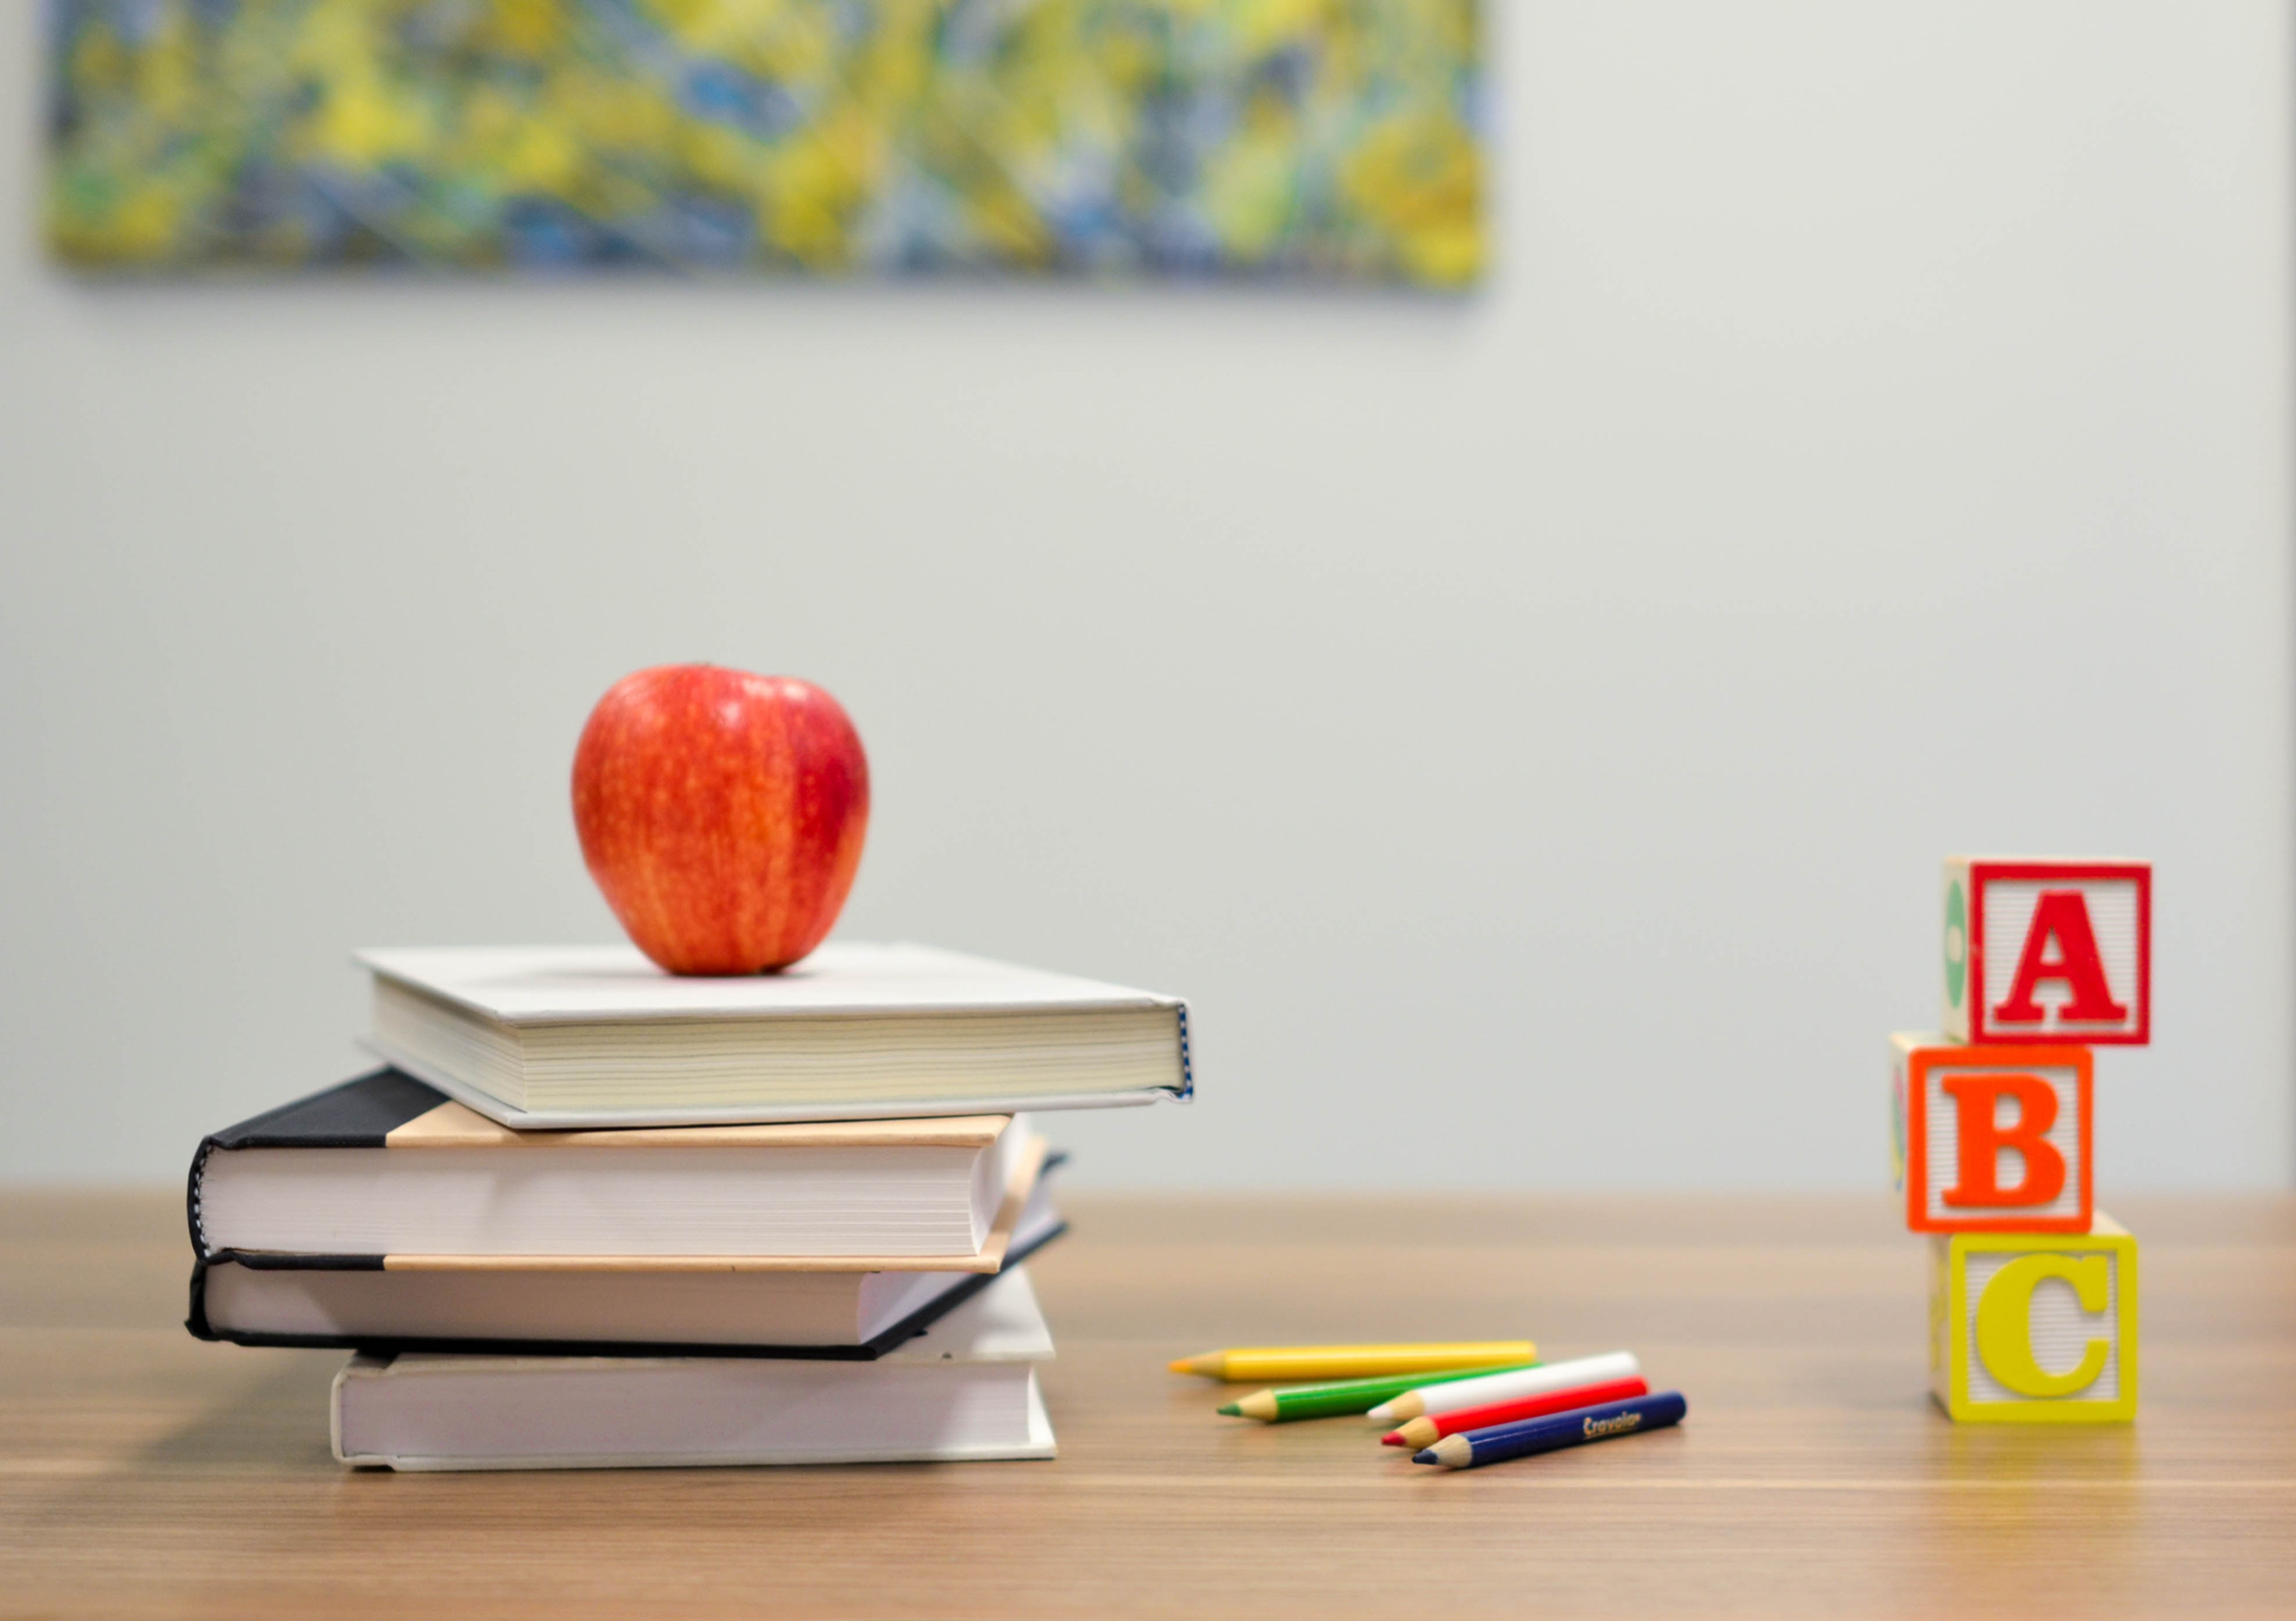 REVELSTOKE SECONDARY SCHOOL CLINIC